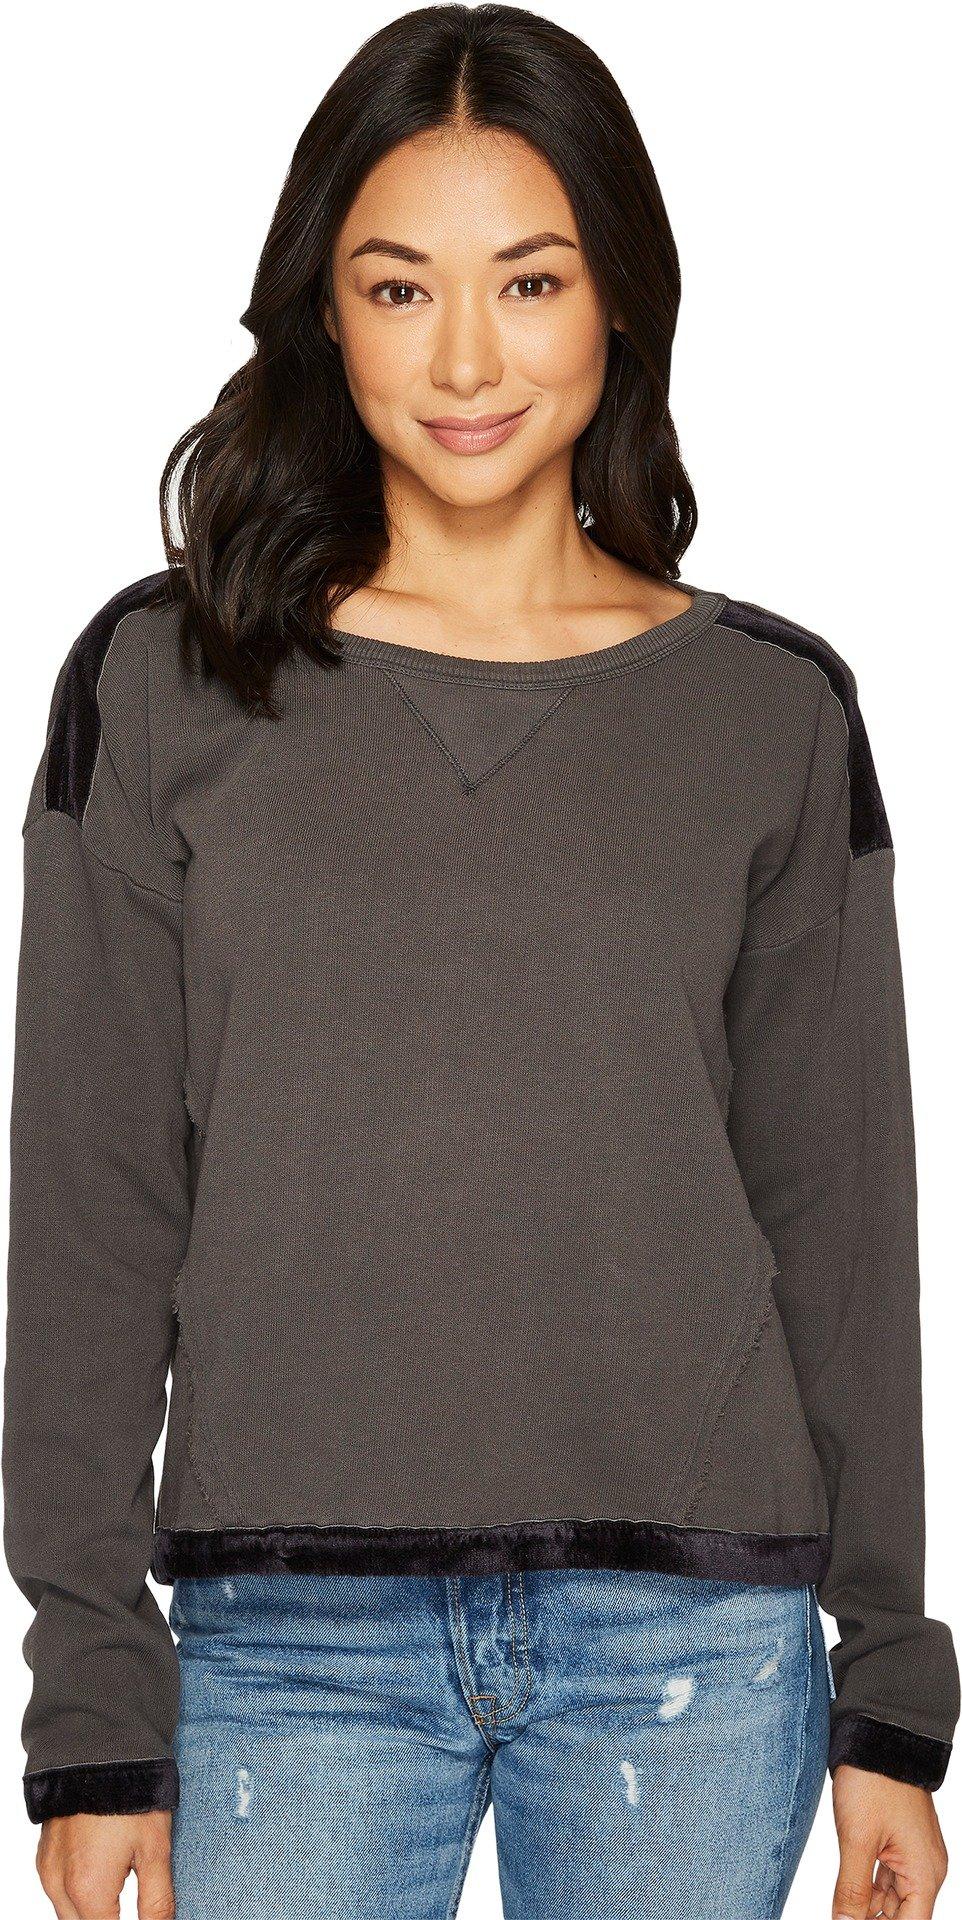 Splendid Women's Velvet Trim Mixed Media Pullover Sweatshirt Lead Small